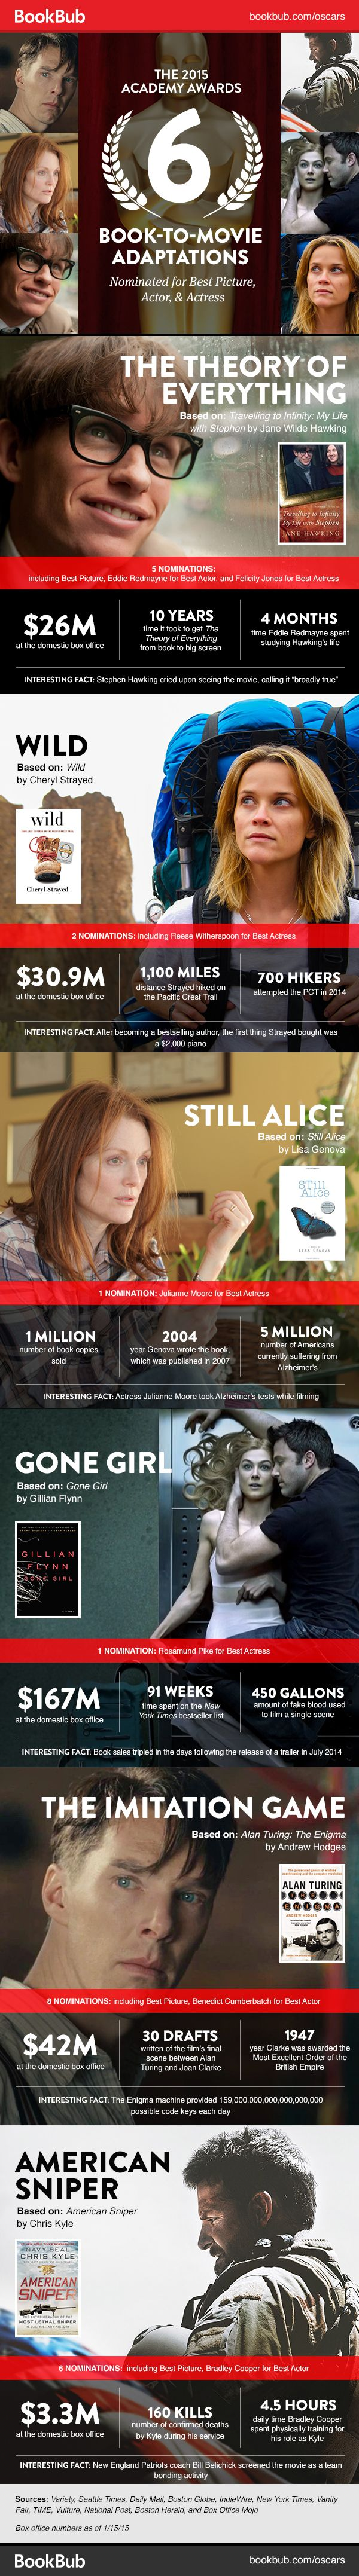 Oscars book graphic